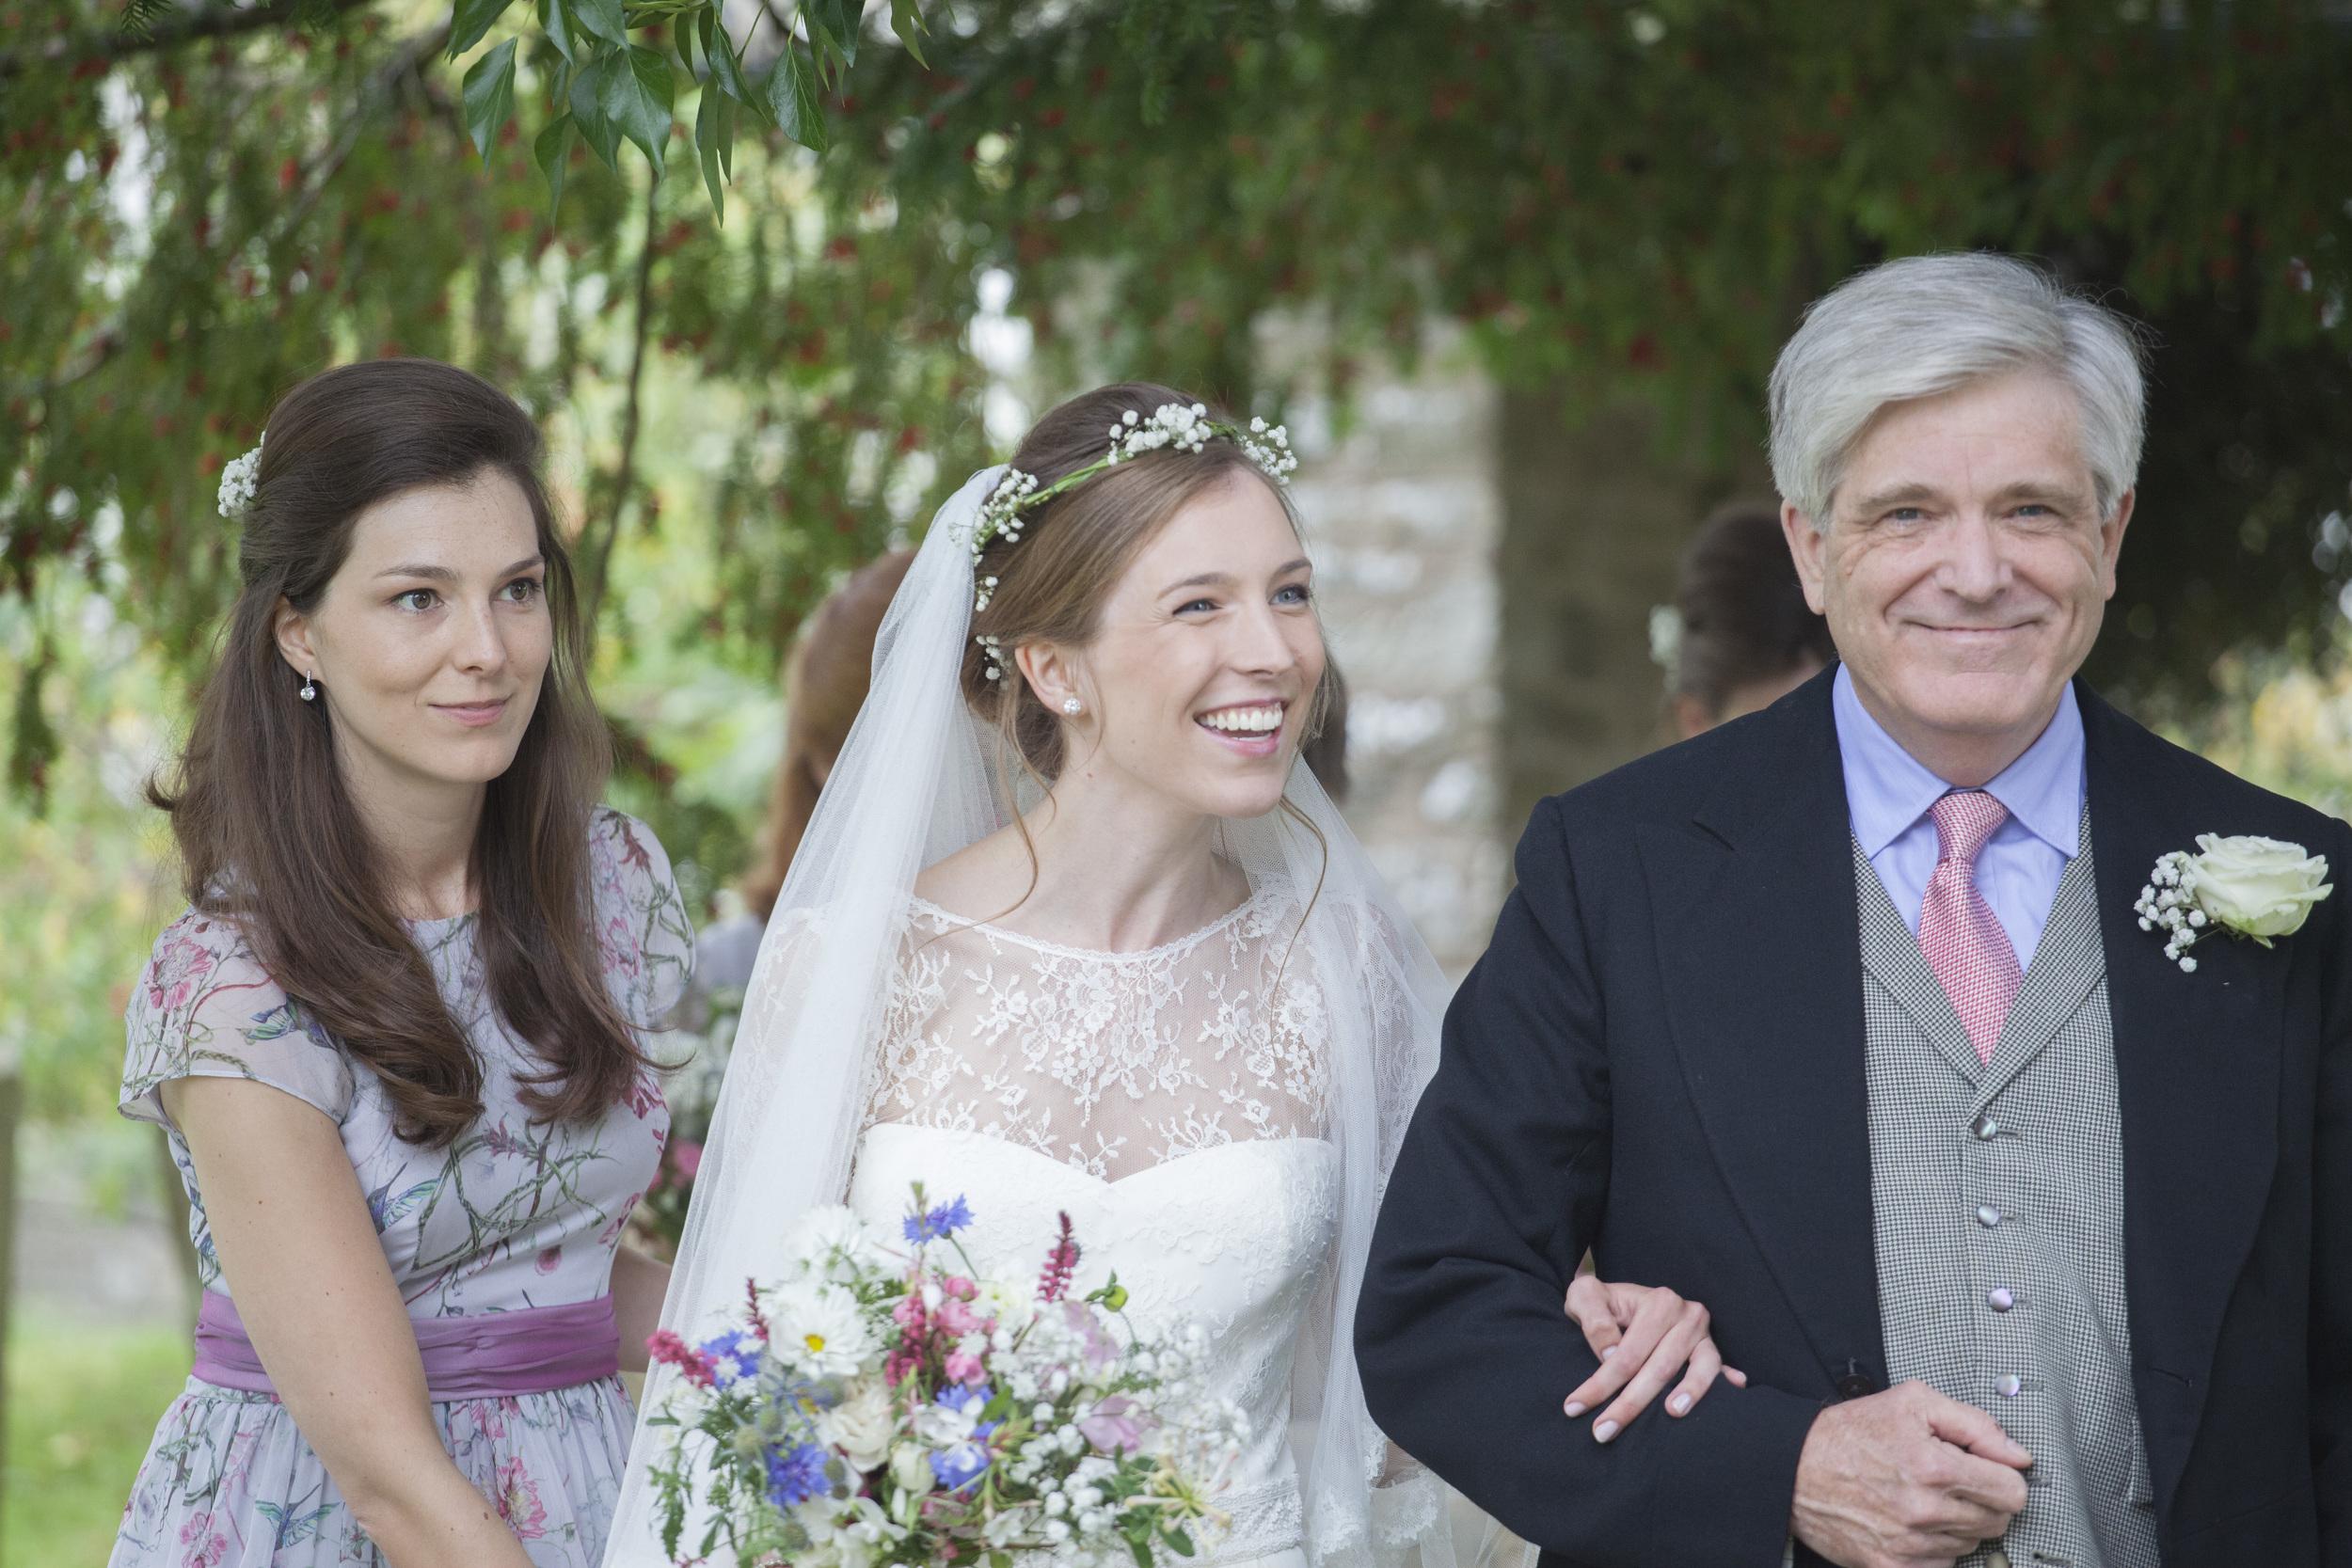 A-Sophie-Ralph-Shropshire-Wedding-Edit_73.jpg